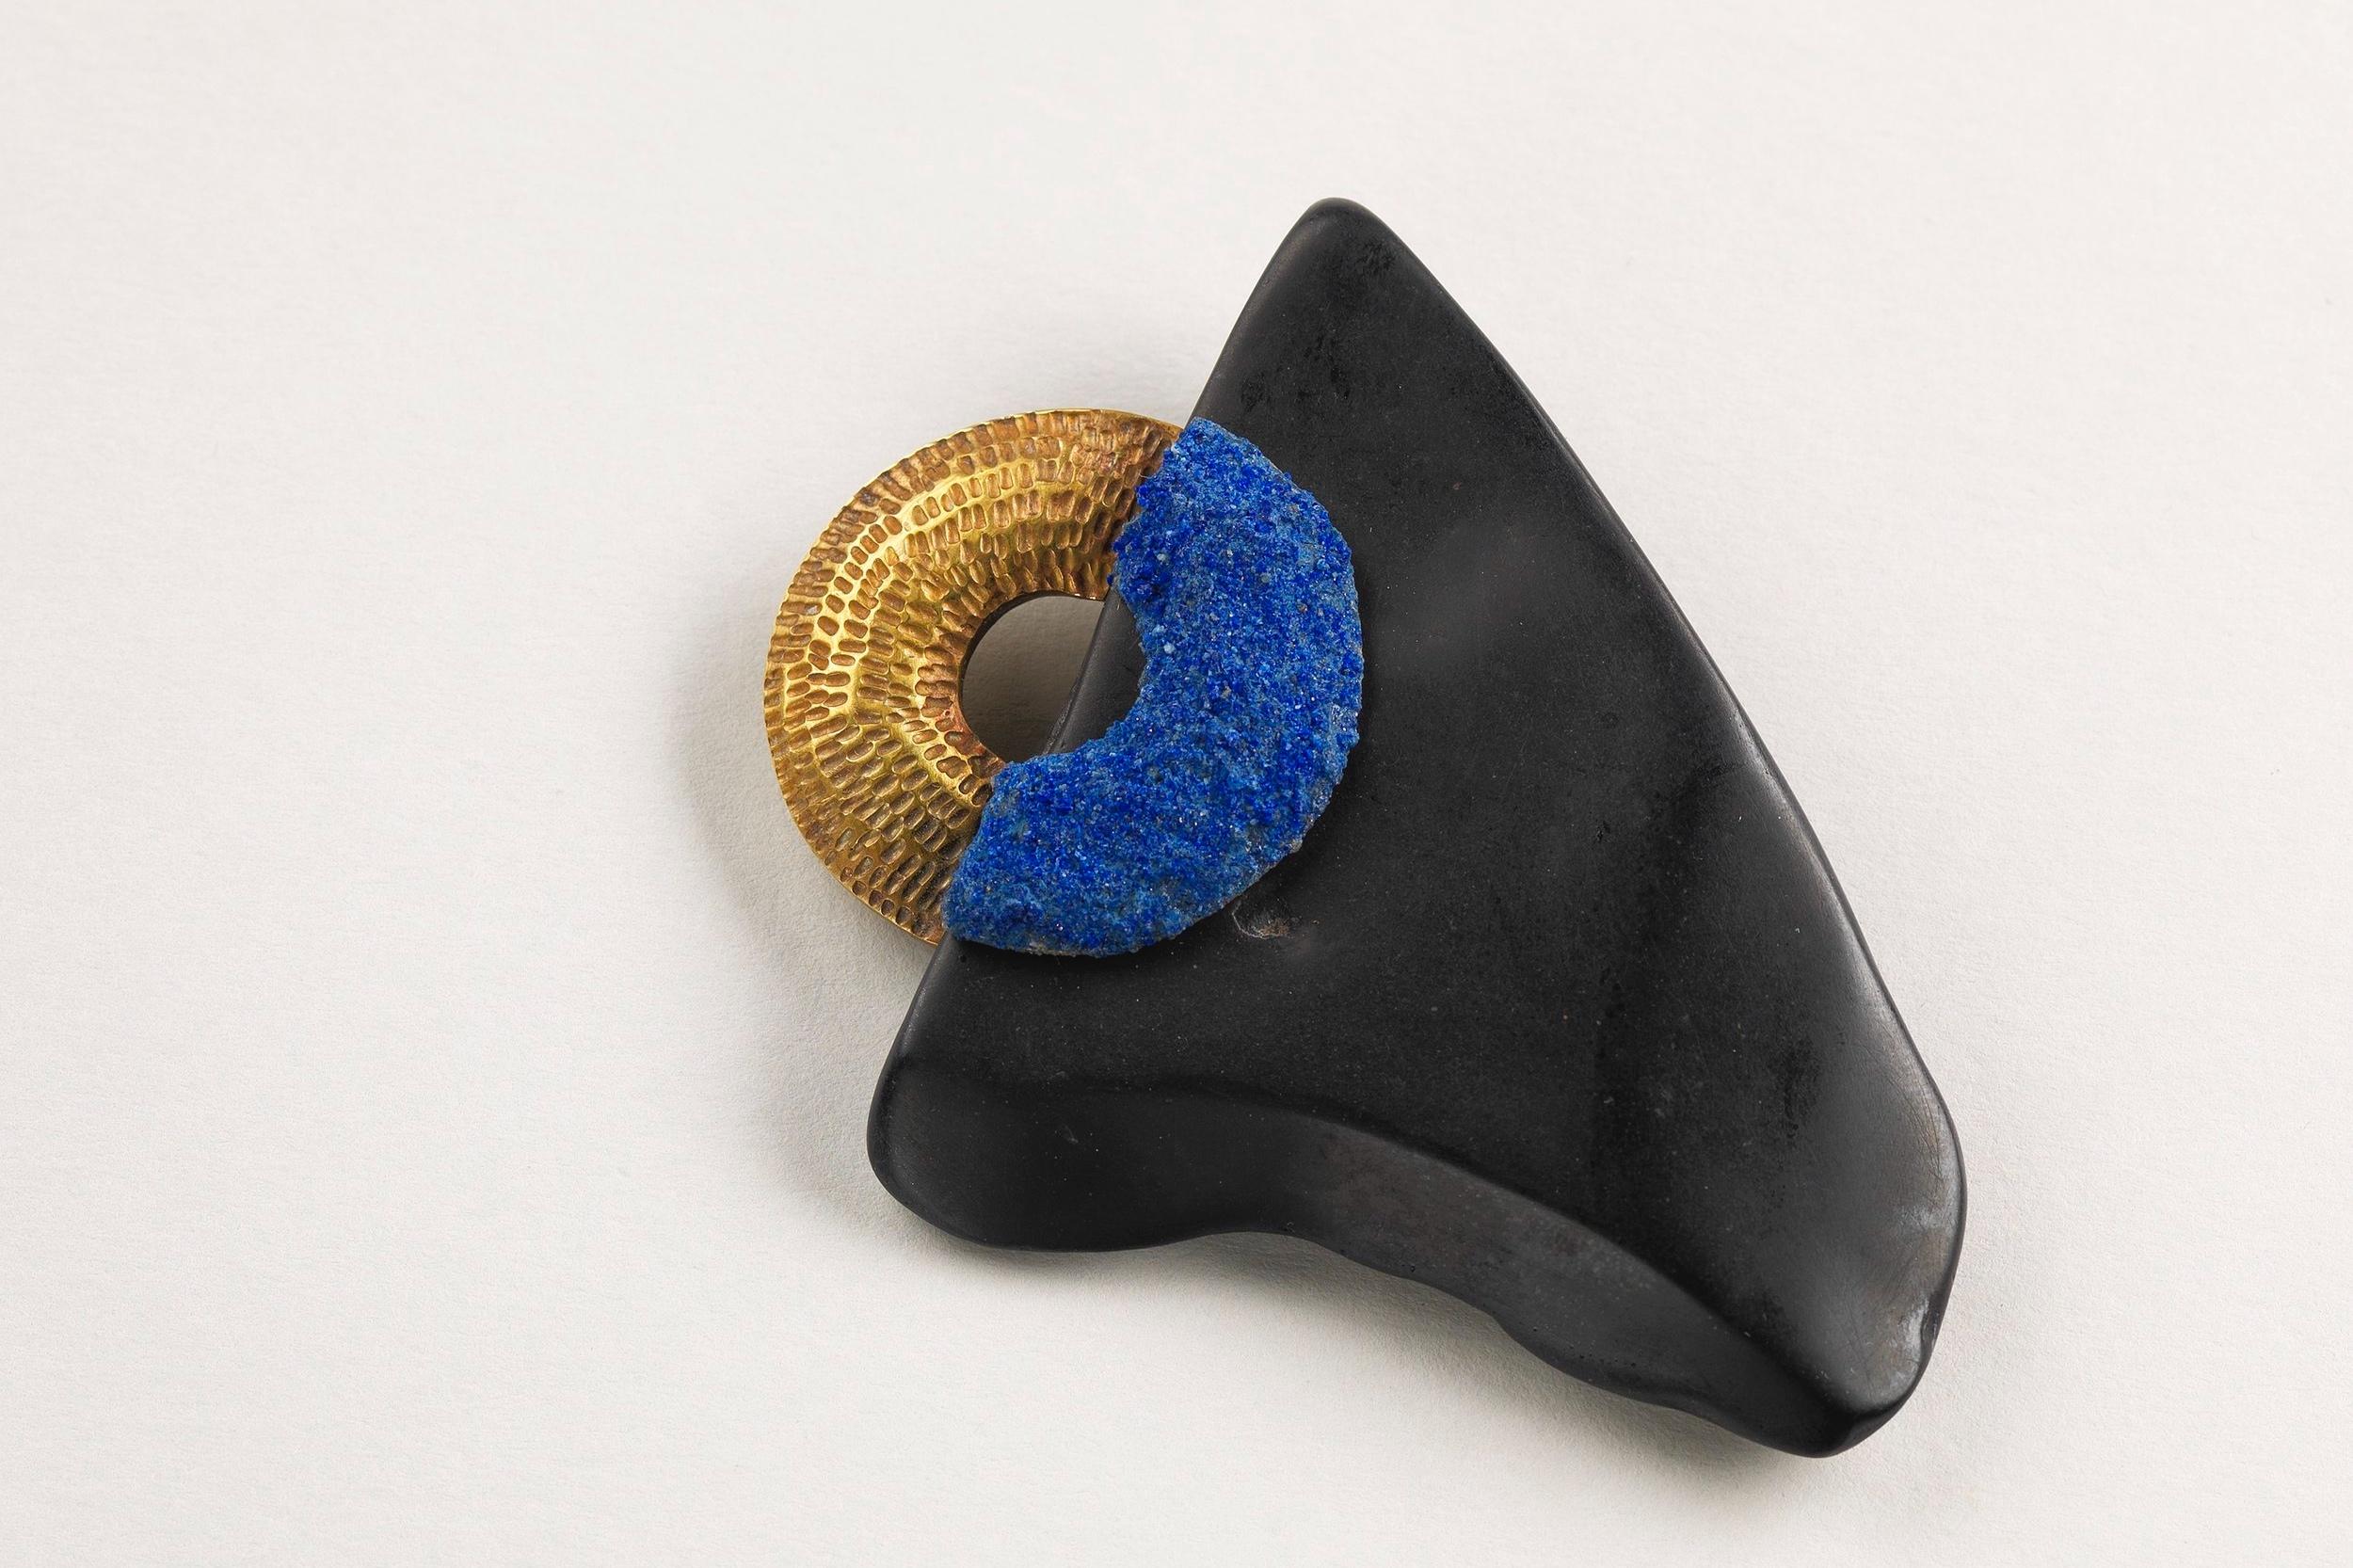 Cobalt Brooch, brass, lapis lazuli, jet - Photo Credit: Shannon Tofts